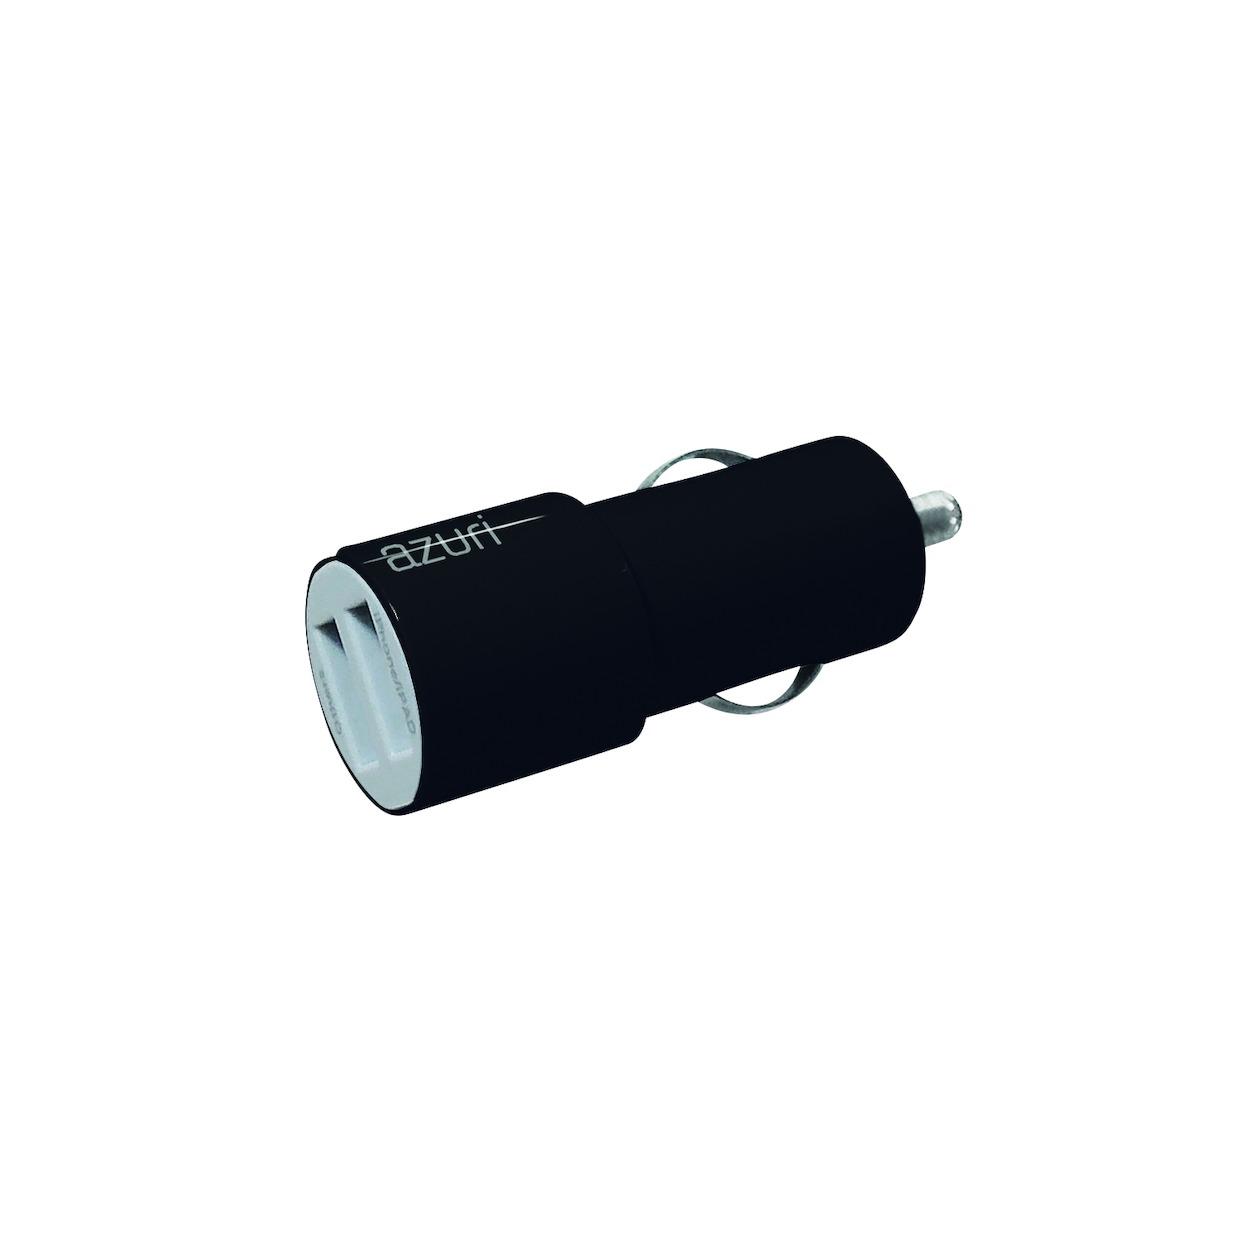 Afbeelding van Azuri oplader Autolader 12V 2 x USB adapter 3,4Amp zwart